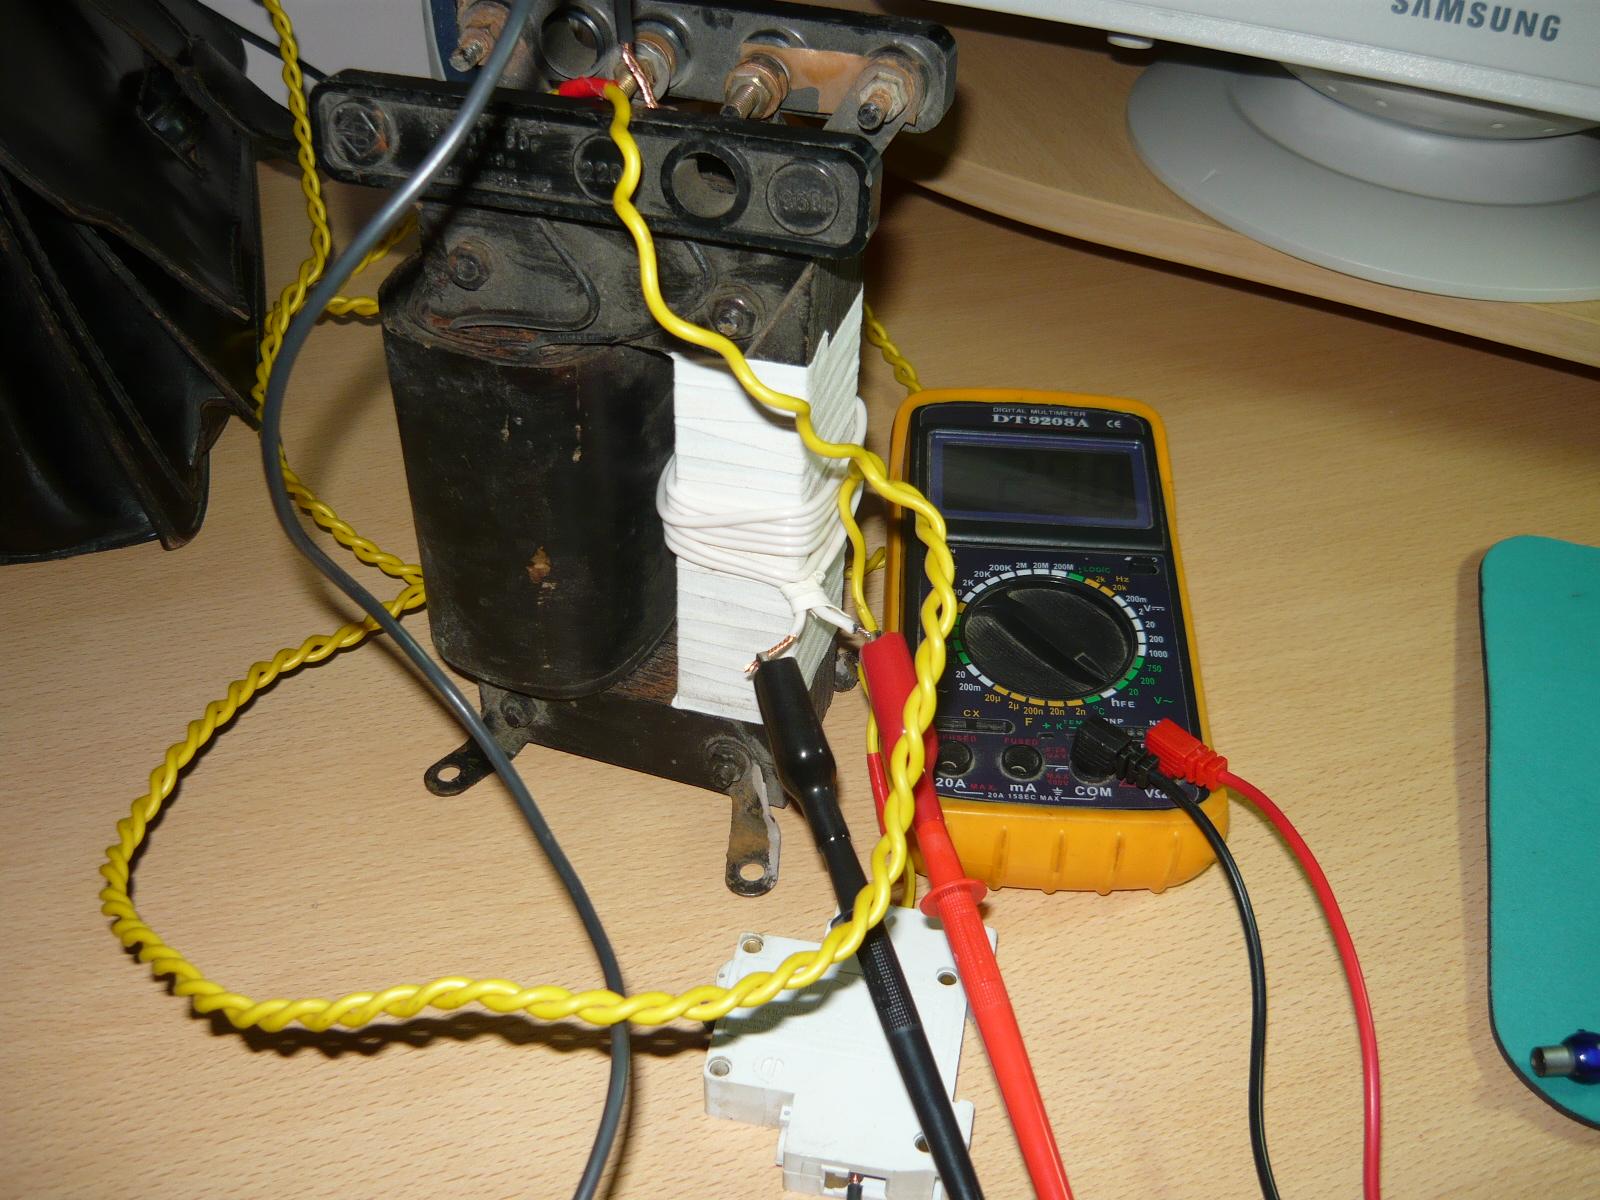 схема присоединения электросчетчика